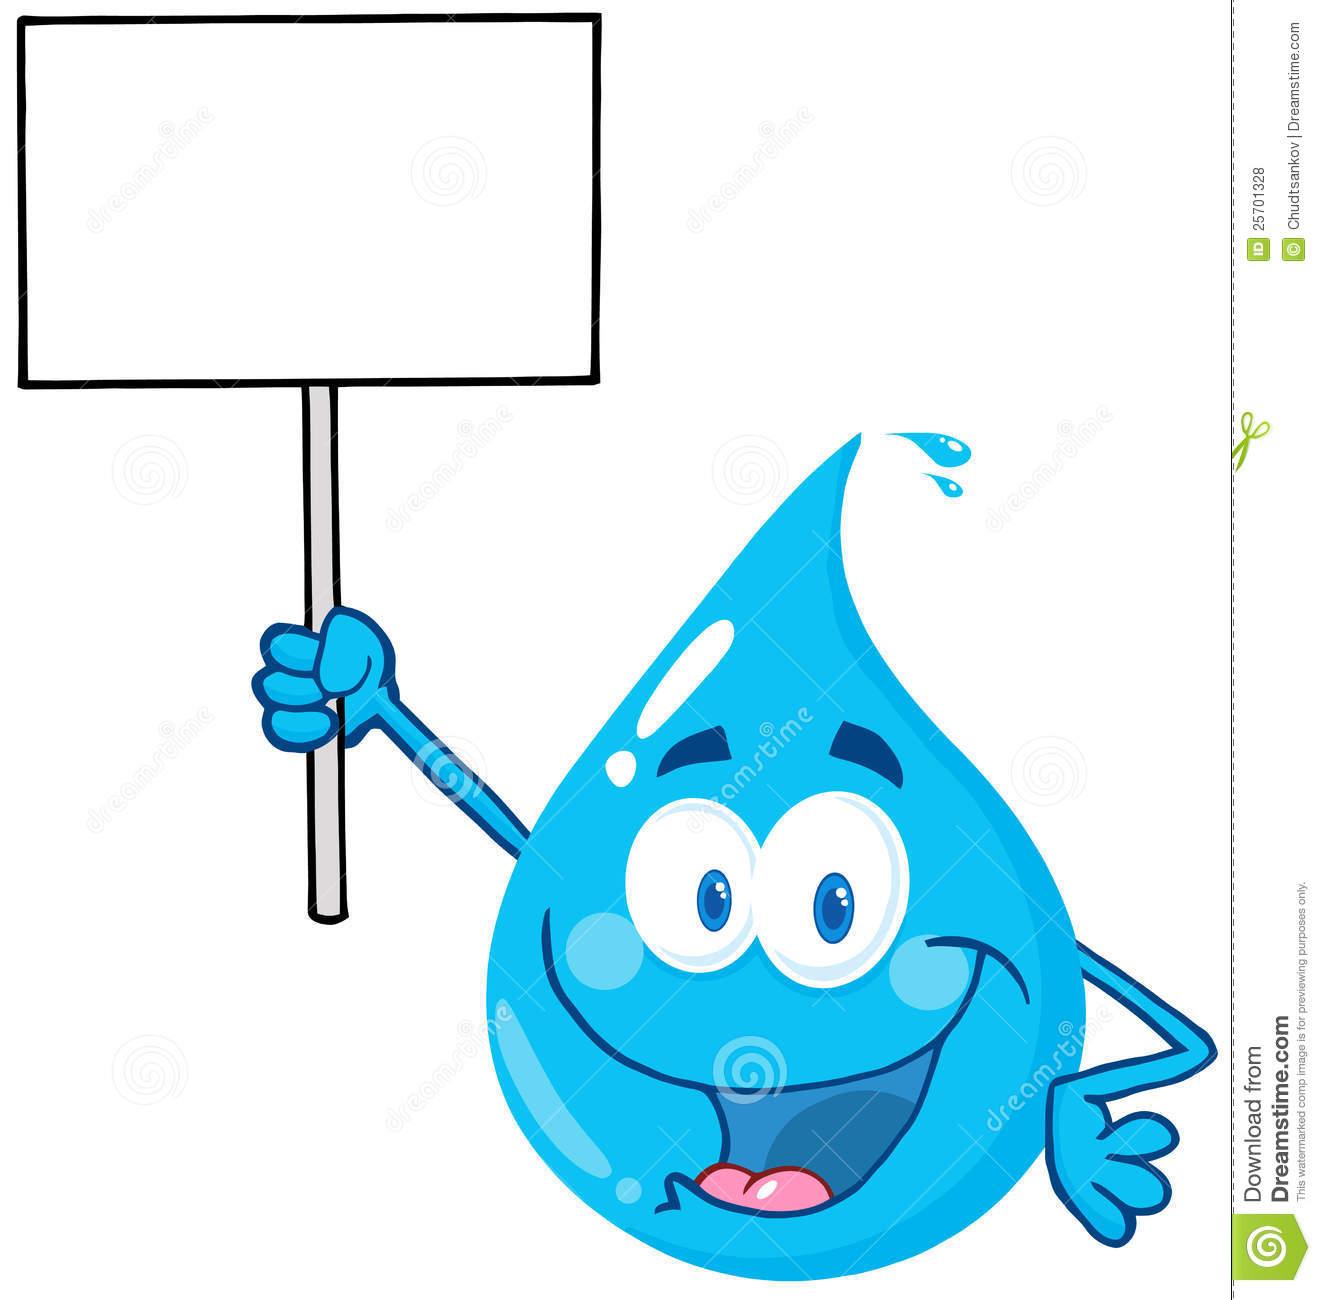 water drop clip art water clipart panda free clipart images rh clipartpanda com clip art watering can clipart water pump